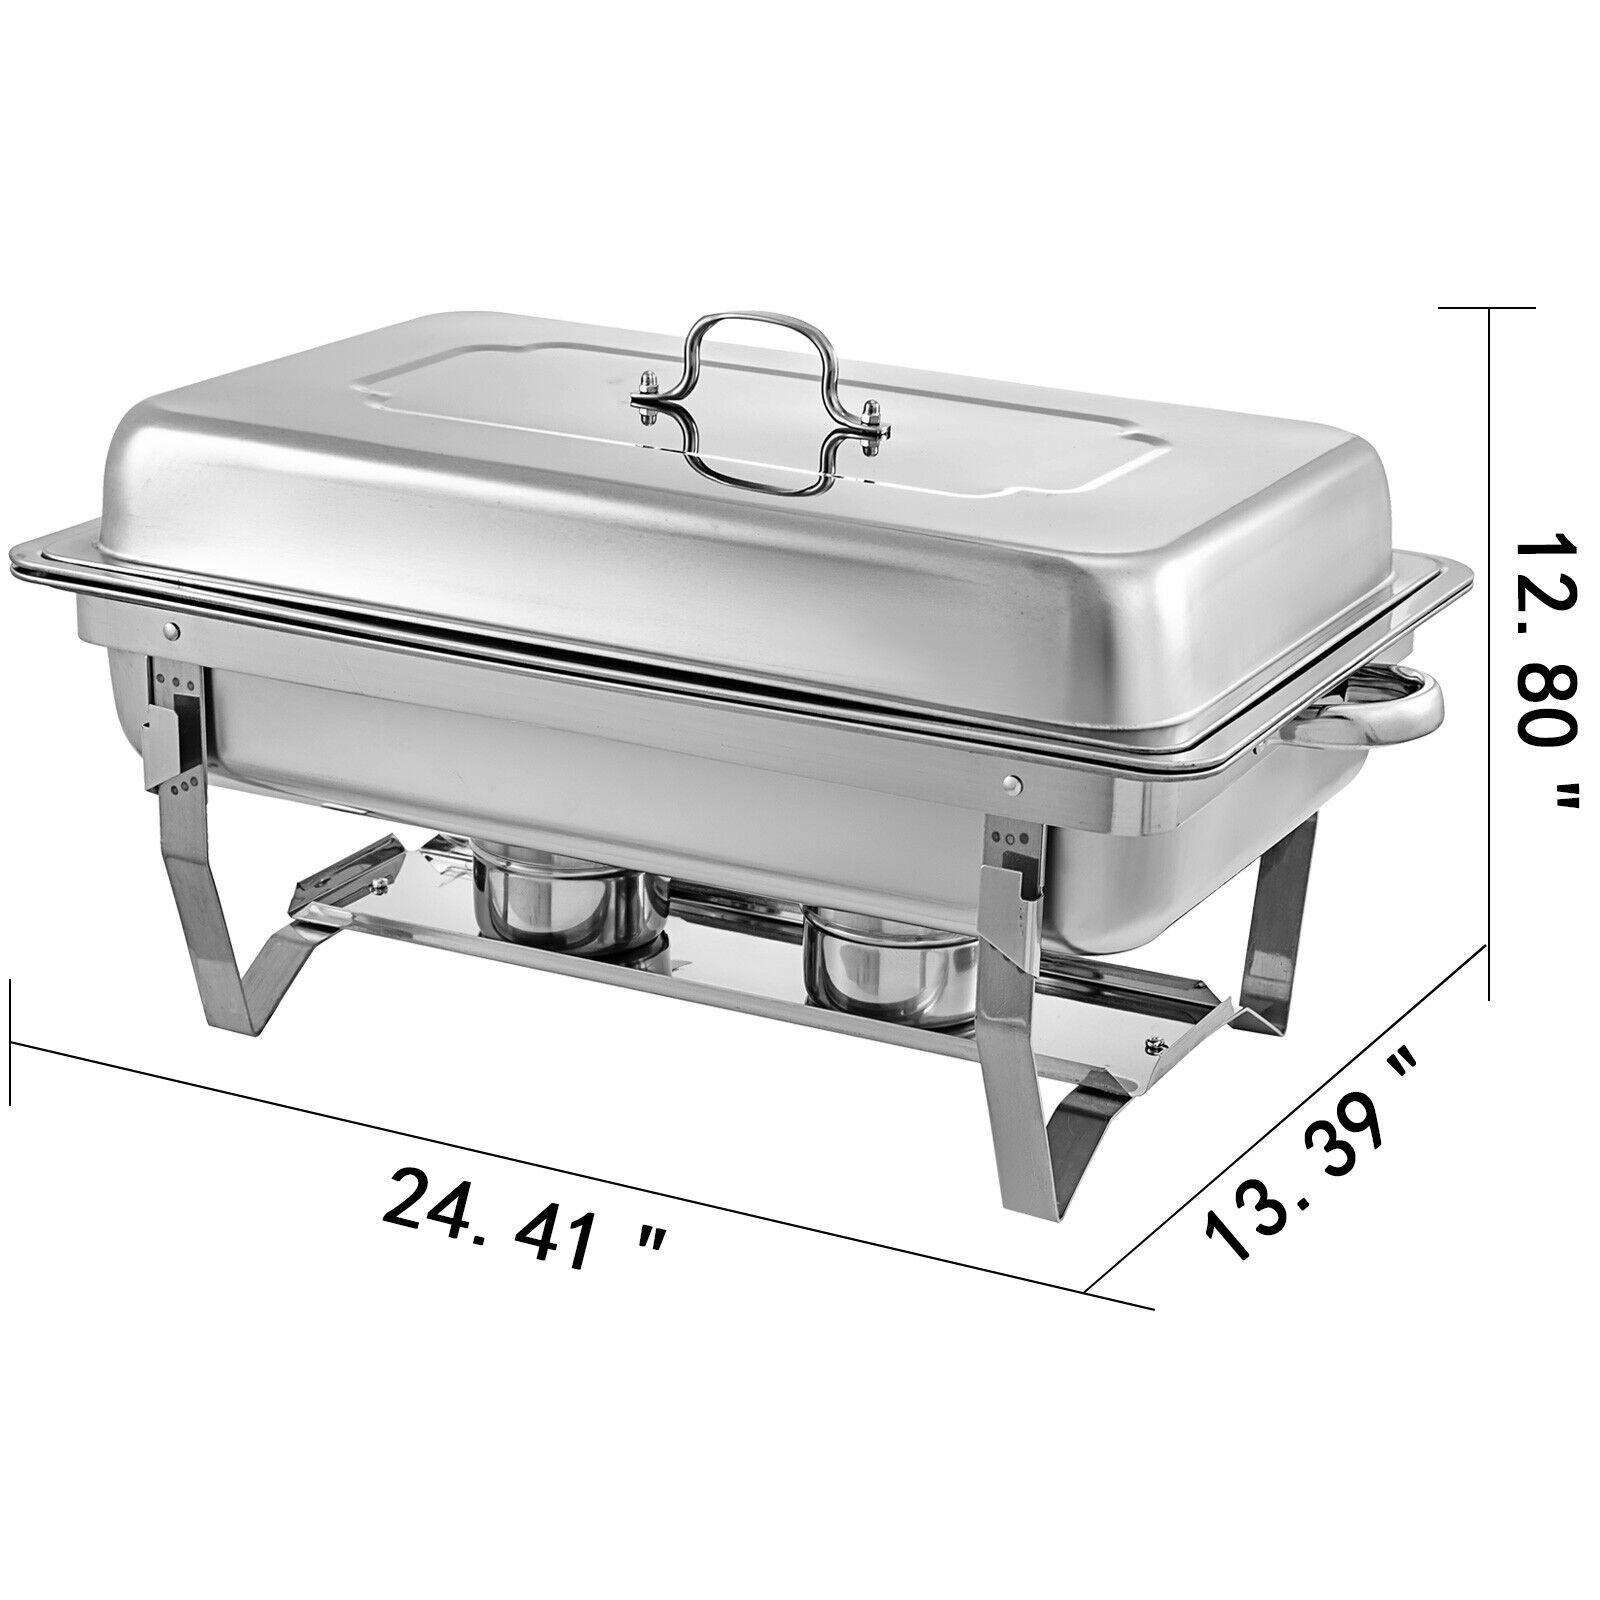 6x 200g burning paste brenngel Food Warmer chafingdish Guest Robe must 8,25 €//Kg